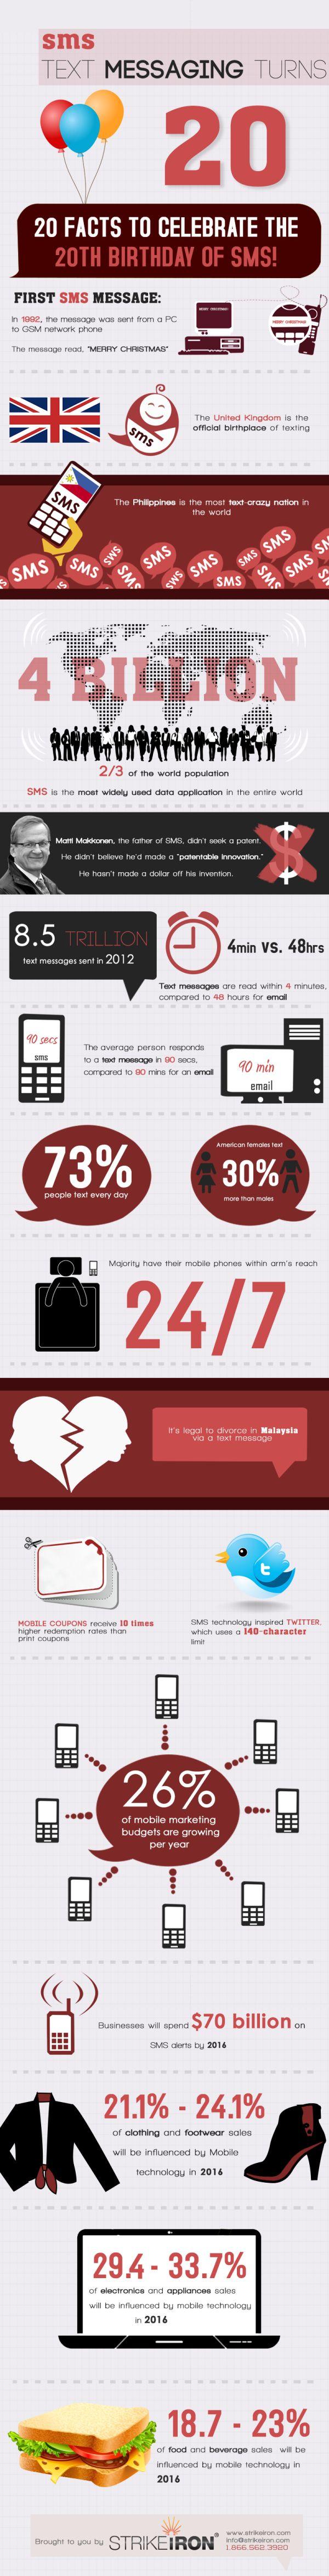 Best 25 text message marketing ideas on pinterest mobile happy 20th birthday sms buycottarizona